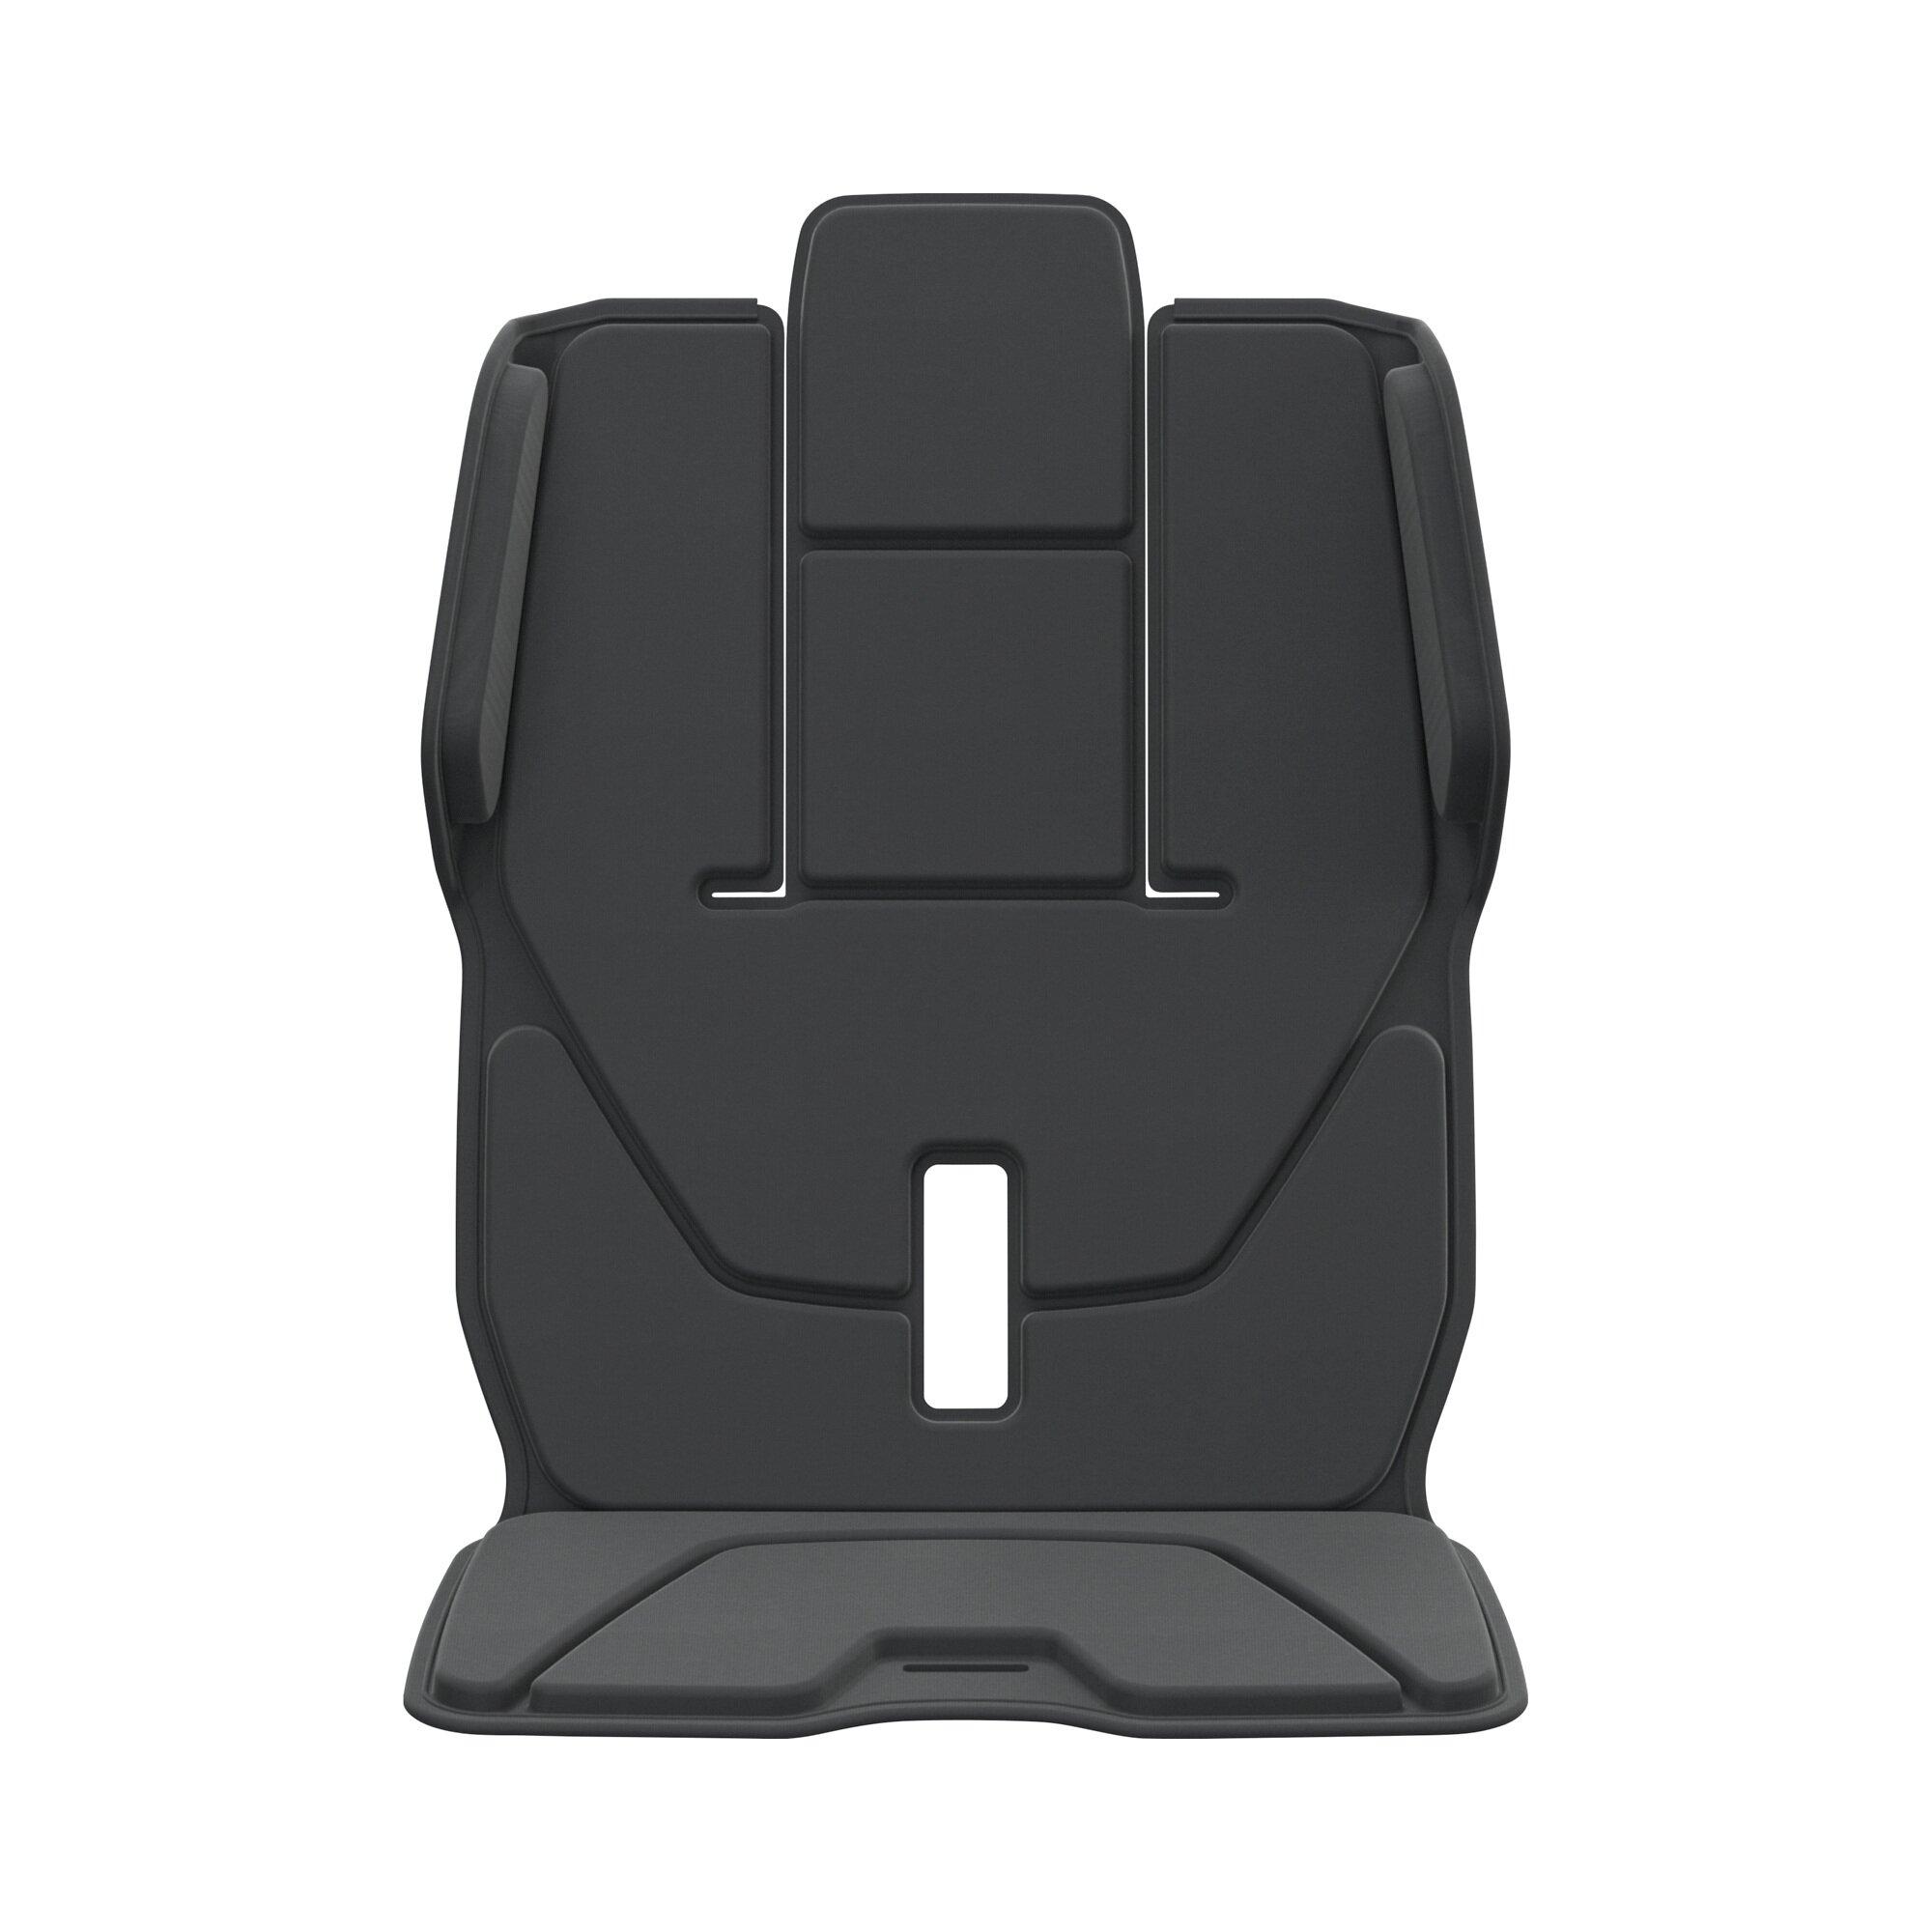 thule-sitzpolster-1-fur-chariot-schwarz